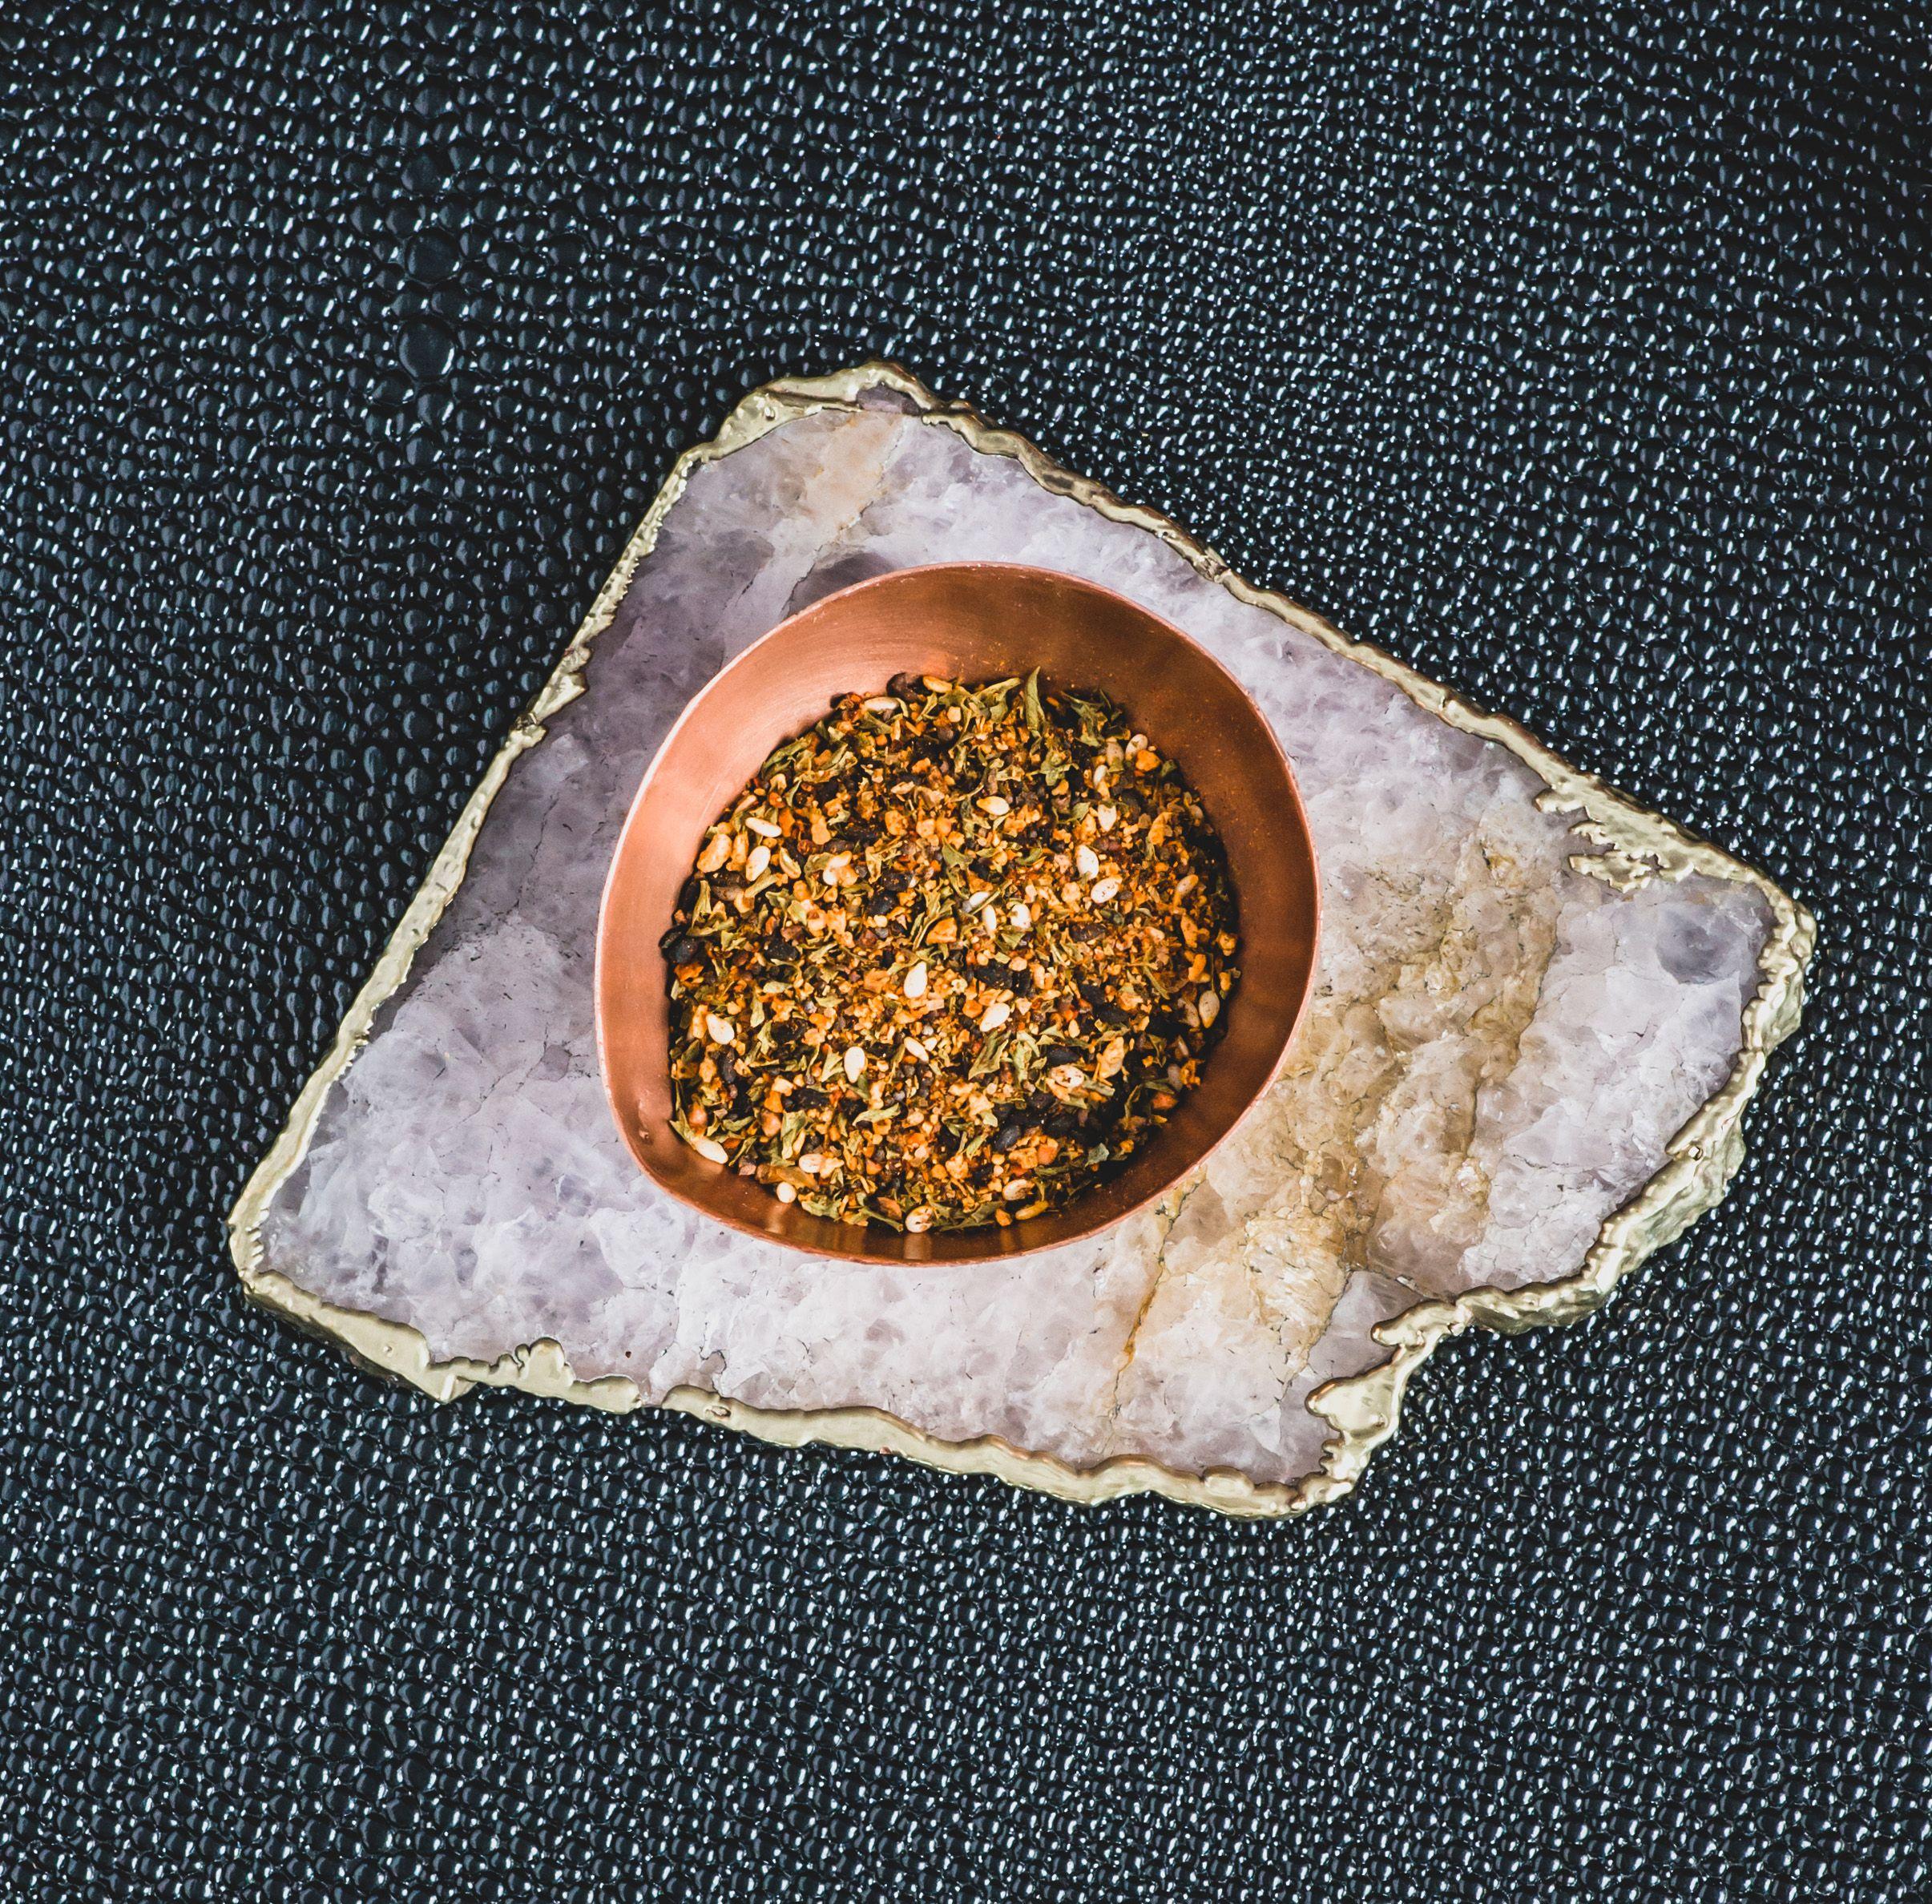 Bourbon barrel wood smoked togarashi juniper culinary